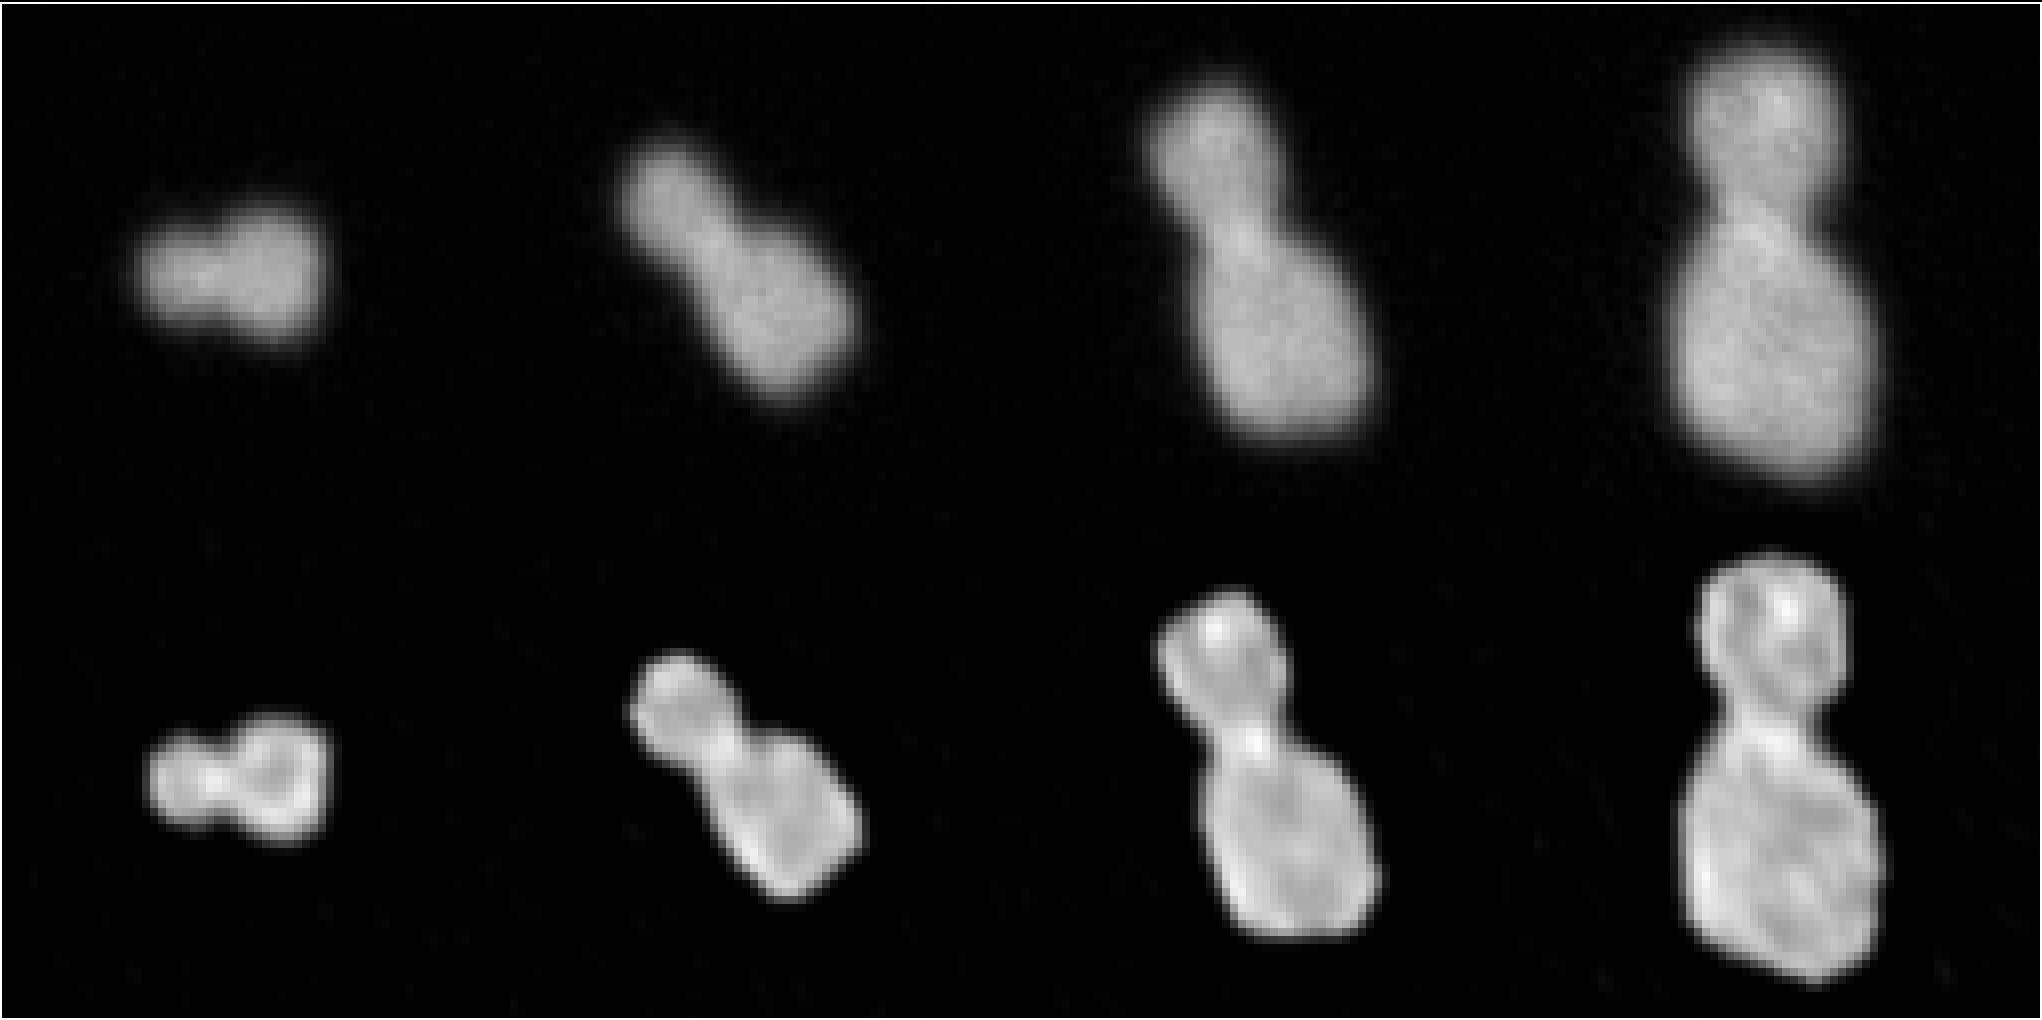 https://planetary.s3.amazonaws.com/assets/images/9-small-bodies/2019/2014mu69-opnavs-stern-tweet-20190115.jpg